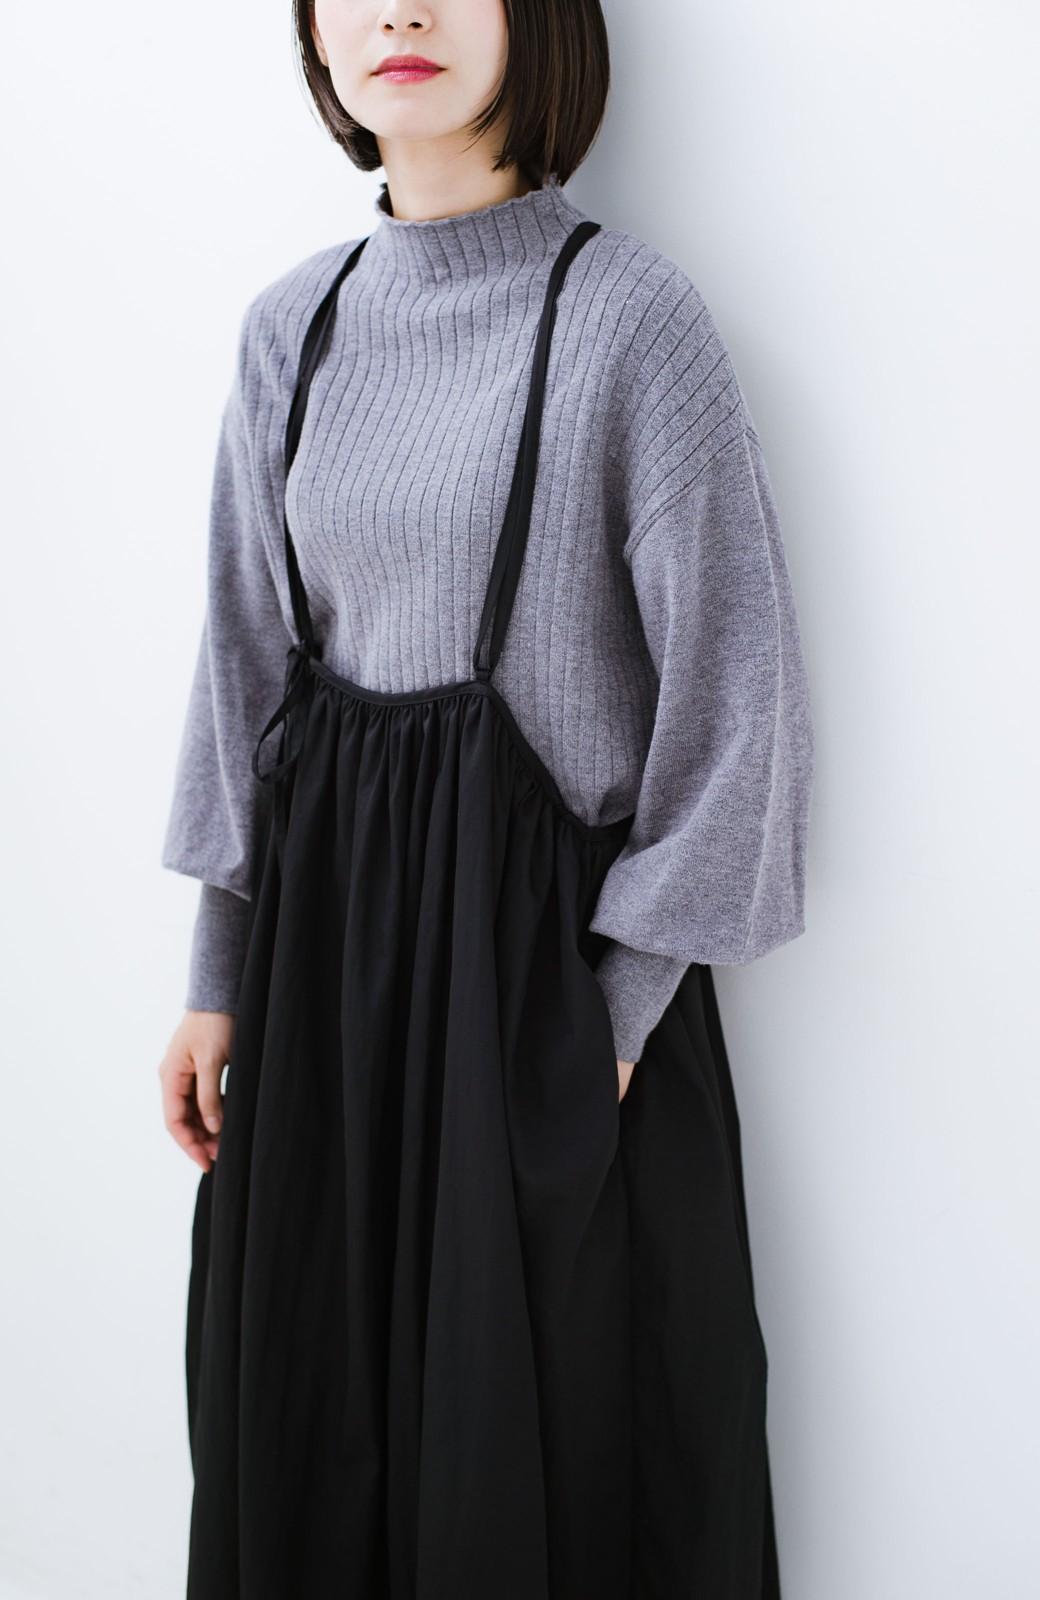 haco! 女の子バンザイ!プロジェクト【ブルー期】 ニットですら重ね着できる安心さ ゆったりギャザーキャミワンピ <ブラック>の商品写真1